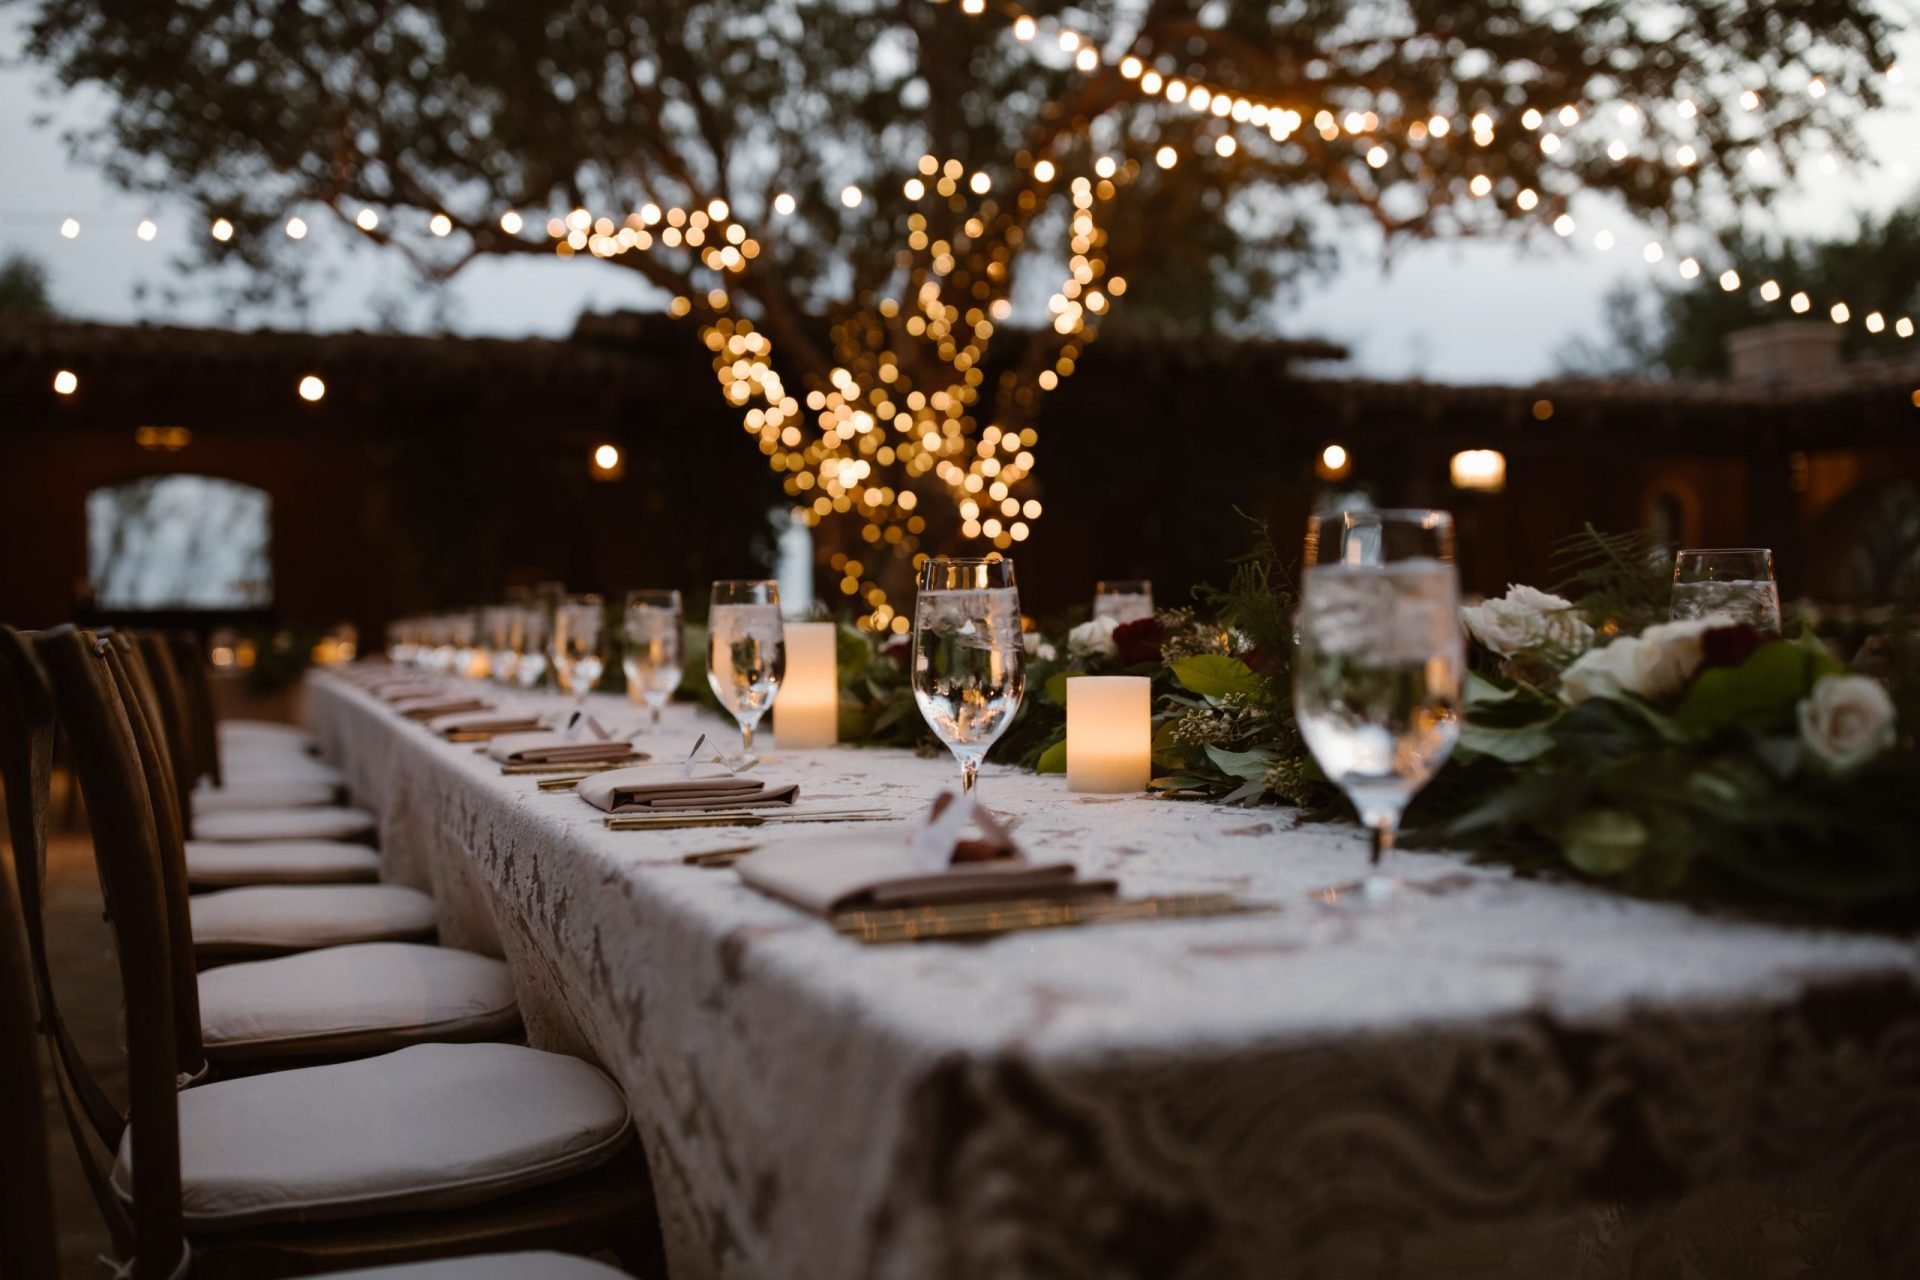 2020 Wedding Plans: Full Steam Ahead!